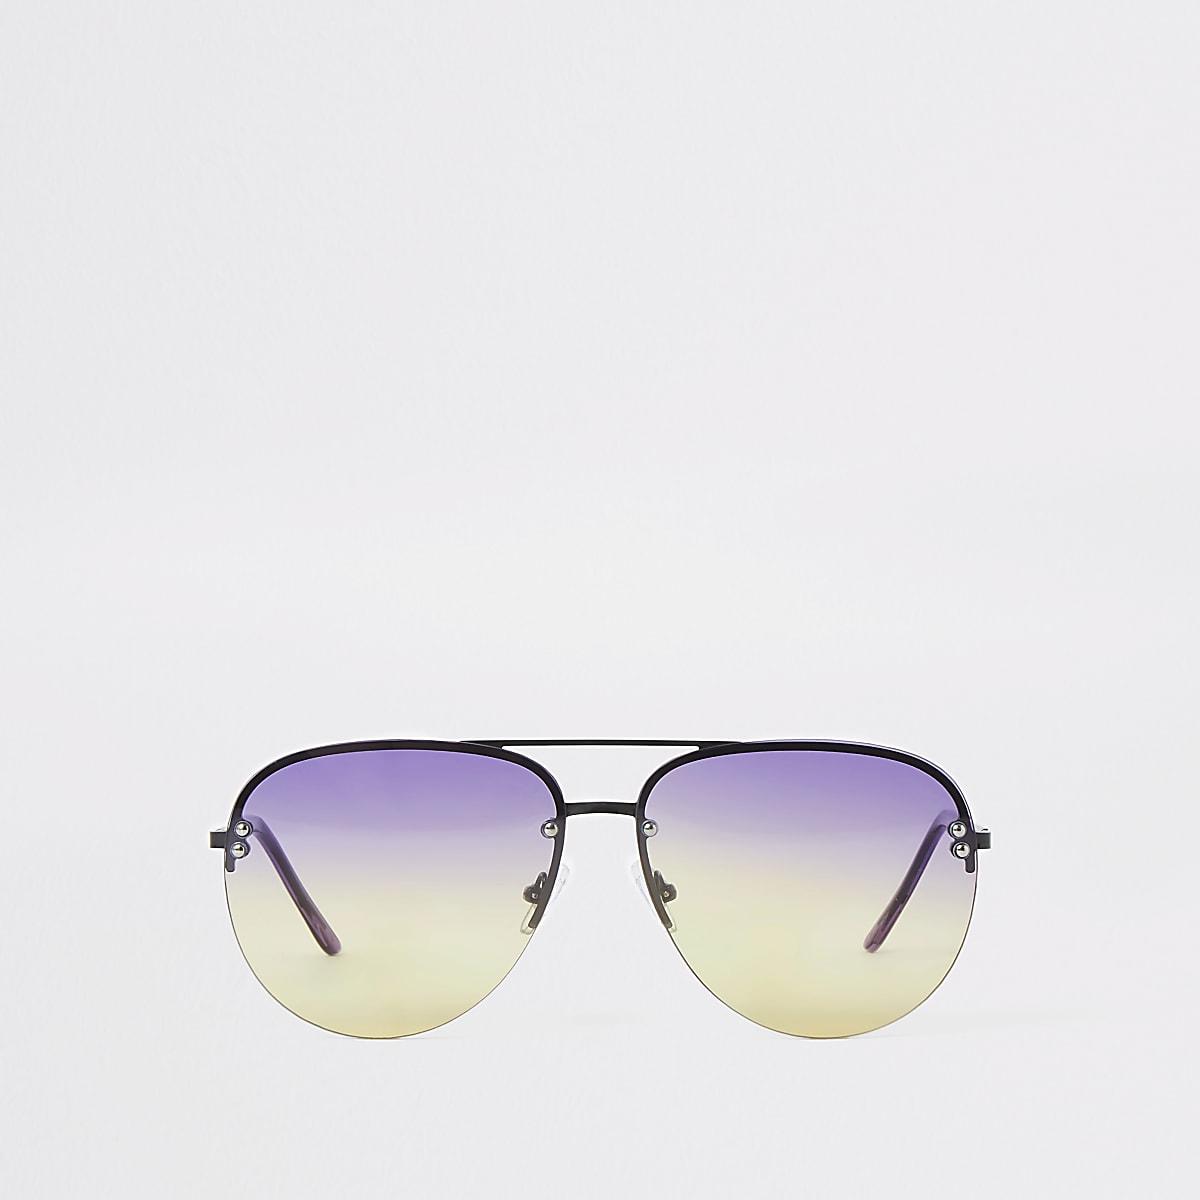 Caroline Flack black ombre aviator sunglasses